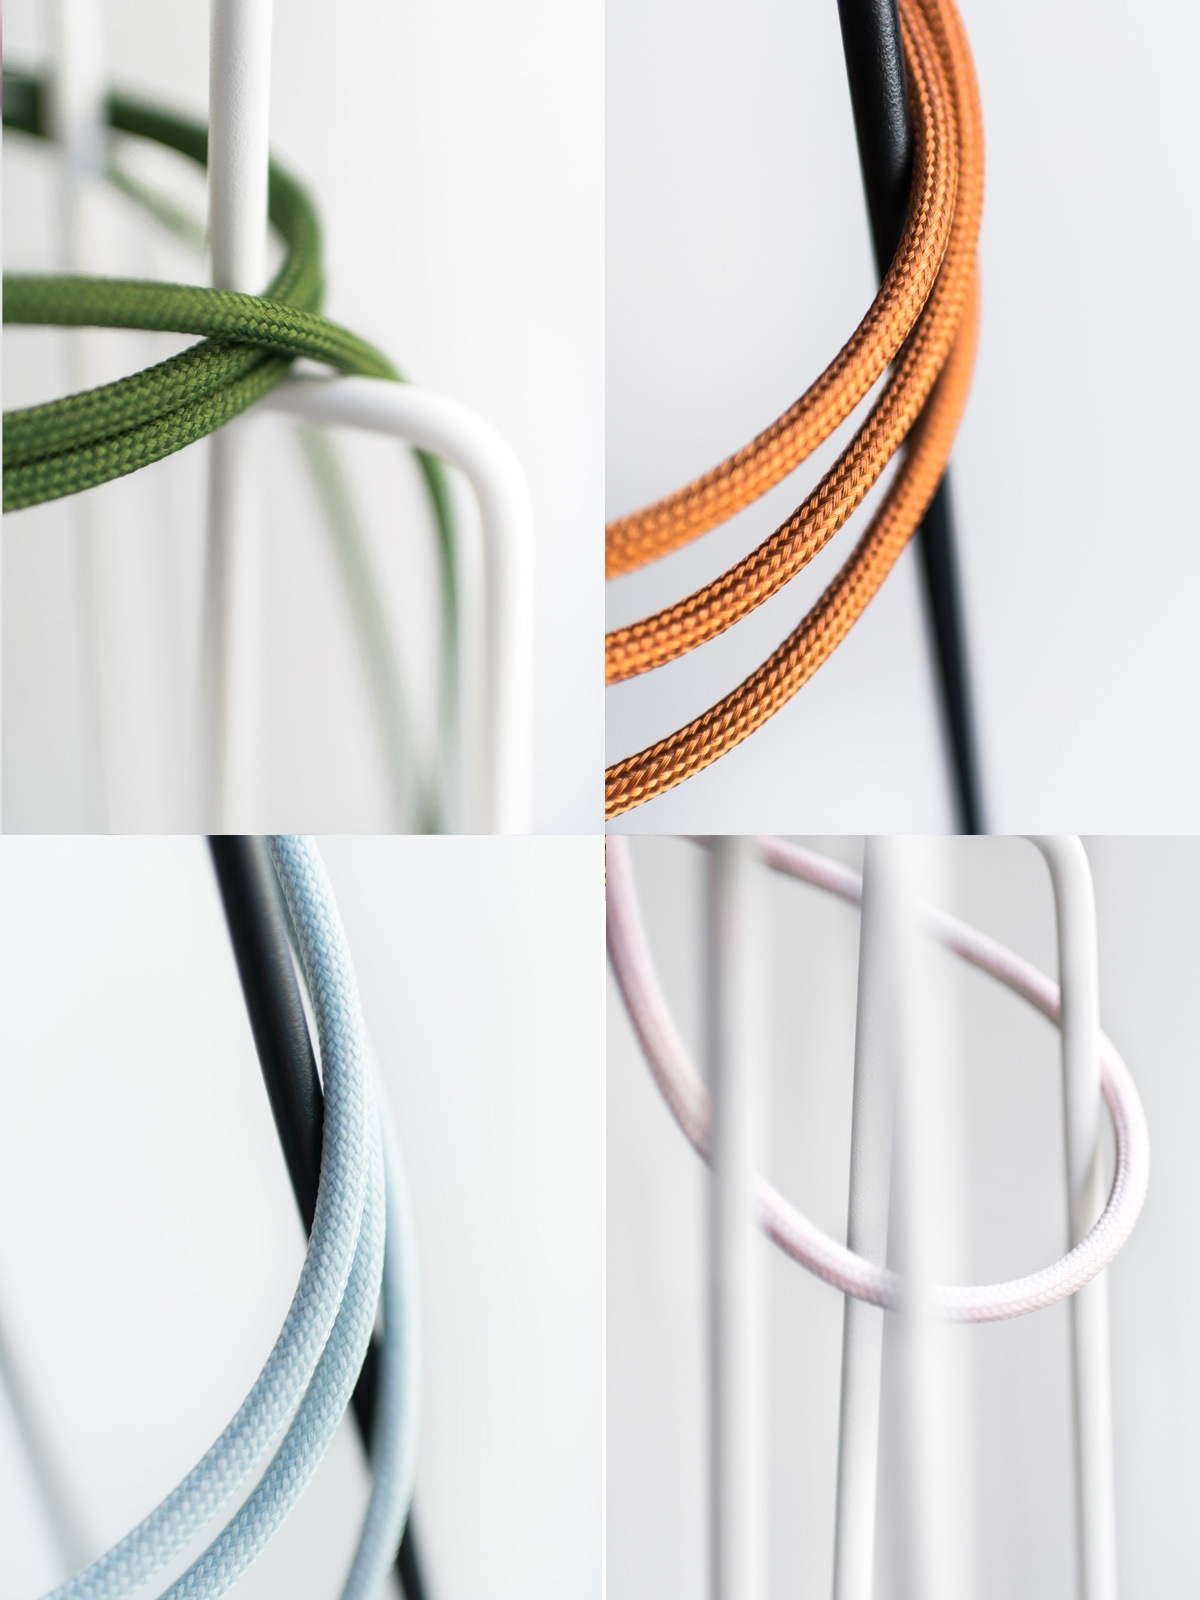 Model Kabel Farben Stehleuchte Grupa Products DesignOrt Lampen